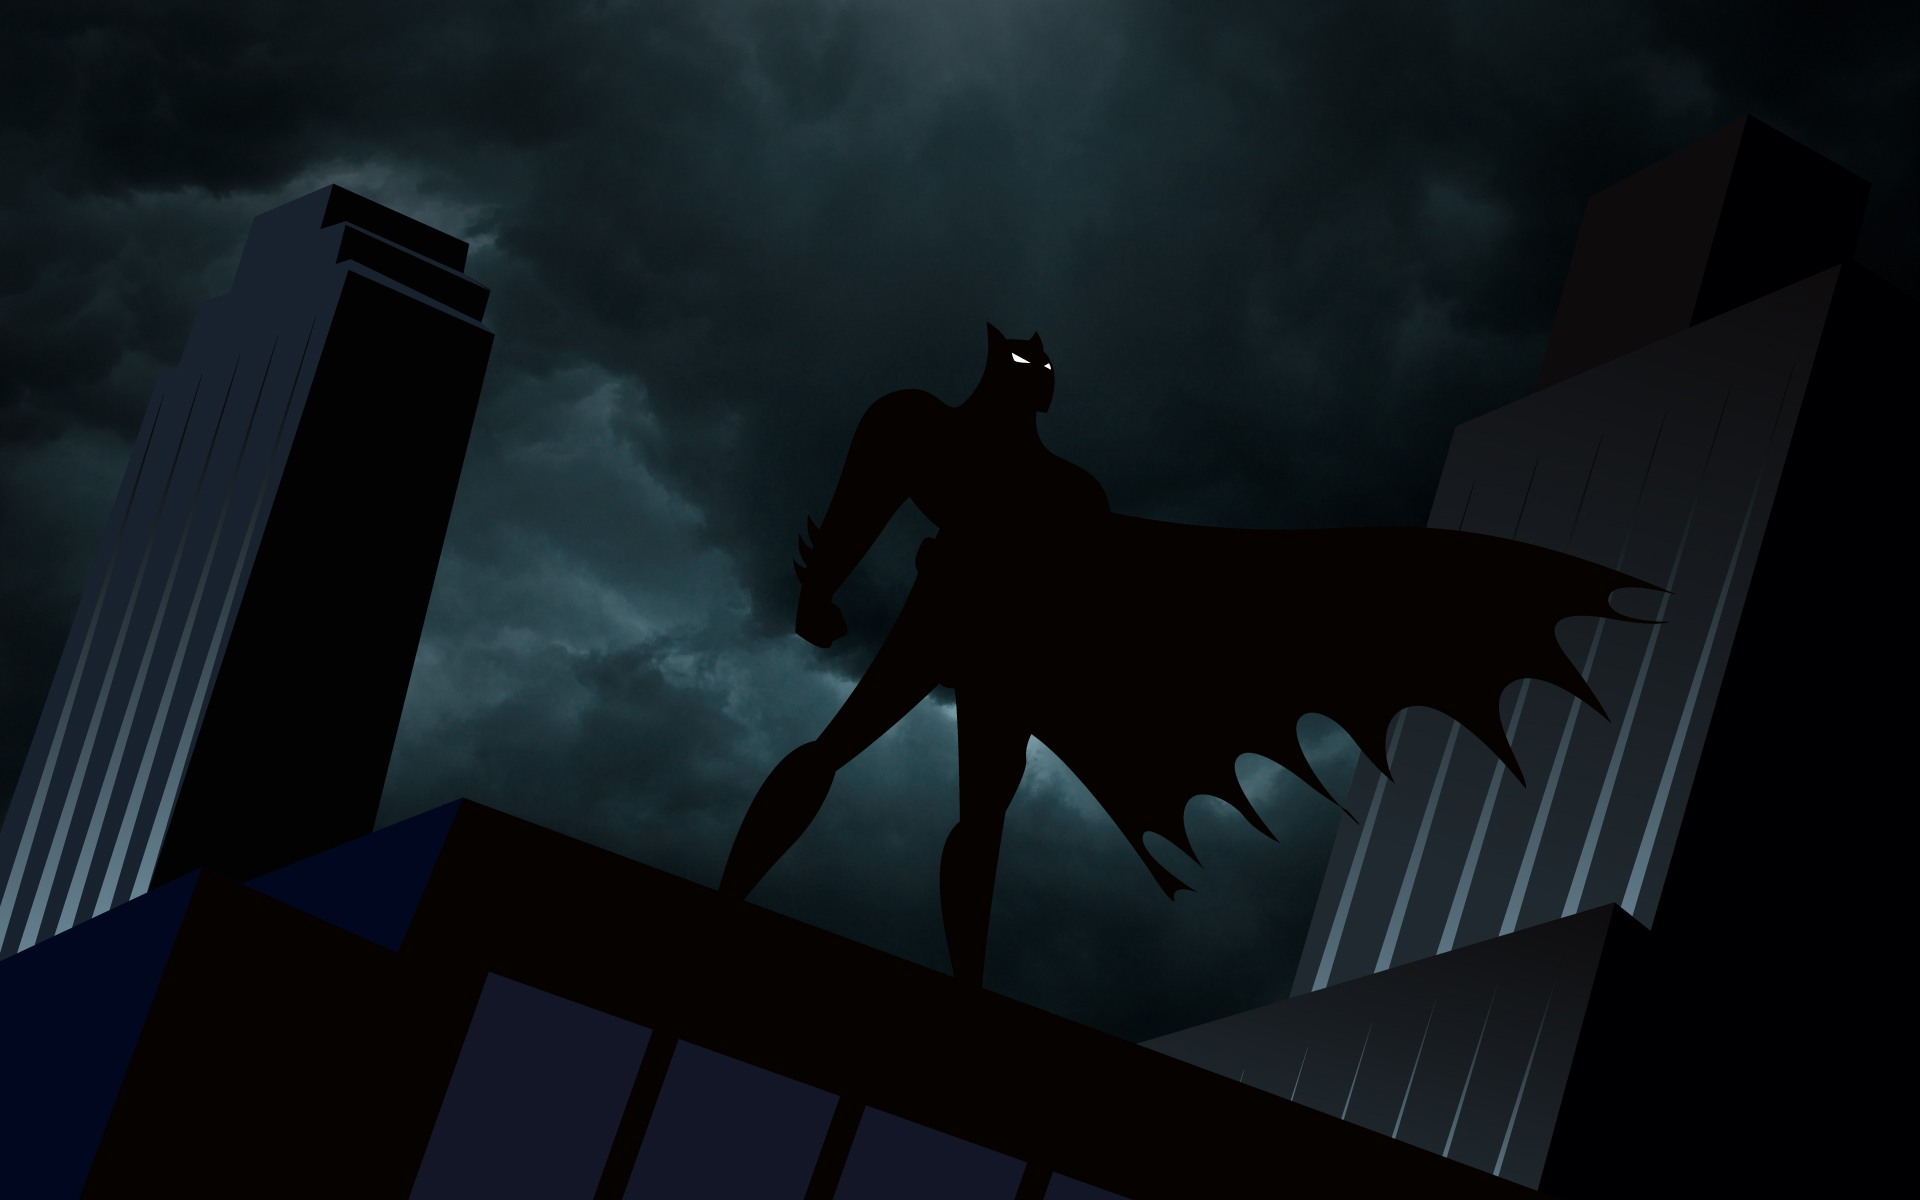 batman animated series wallpaper desktop keyword original 1920x1200